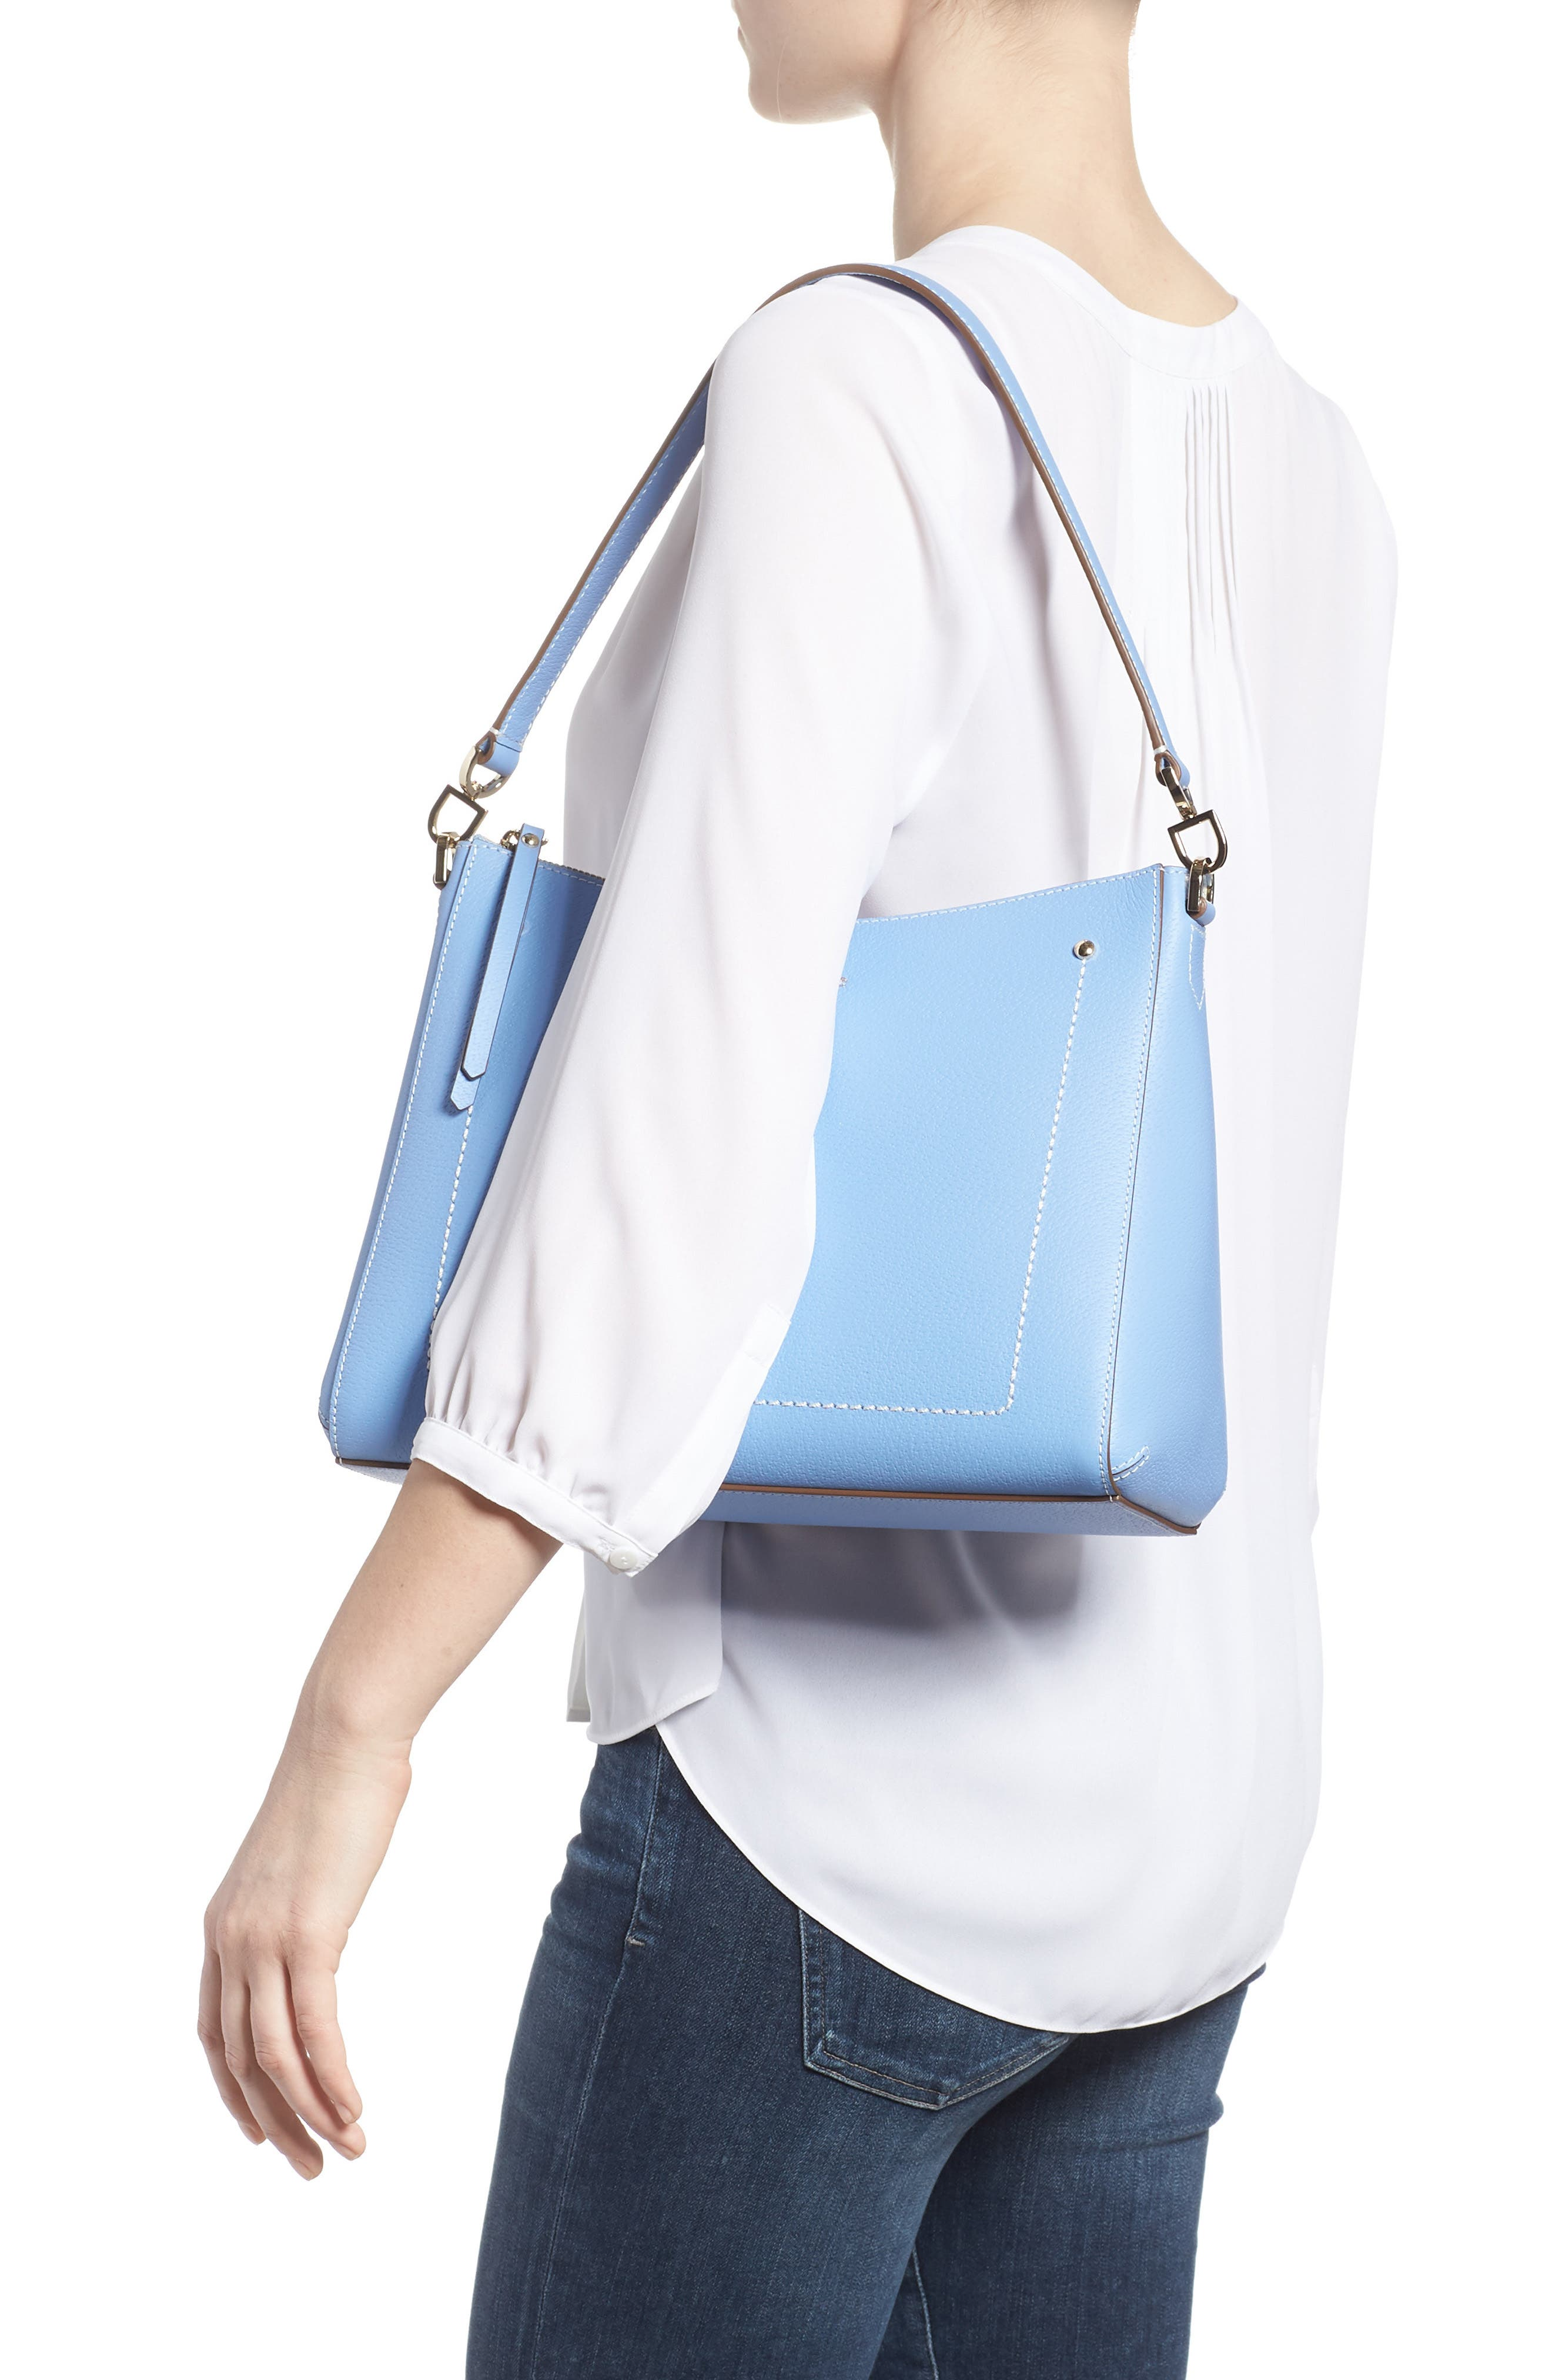 thompson street - marti leather shoulder/crossbody bag,                             Alternate thumbnail 2, color,                             Fable Blue